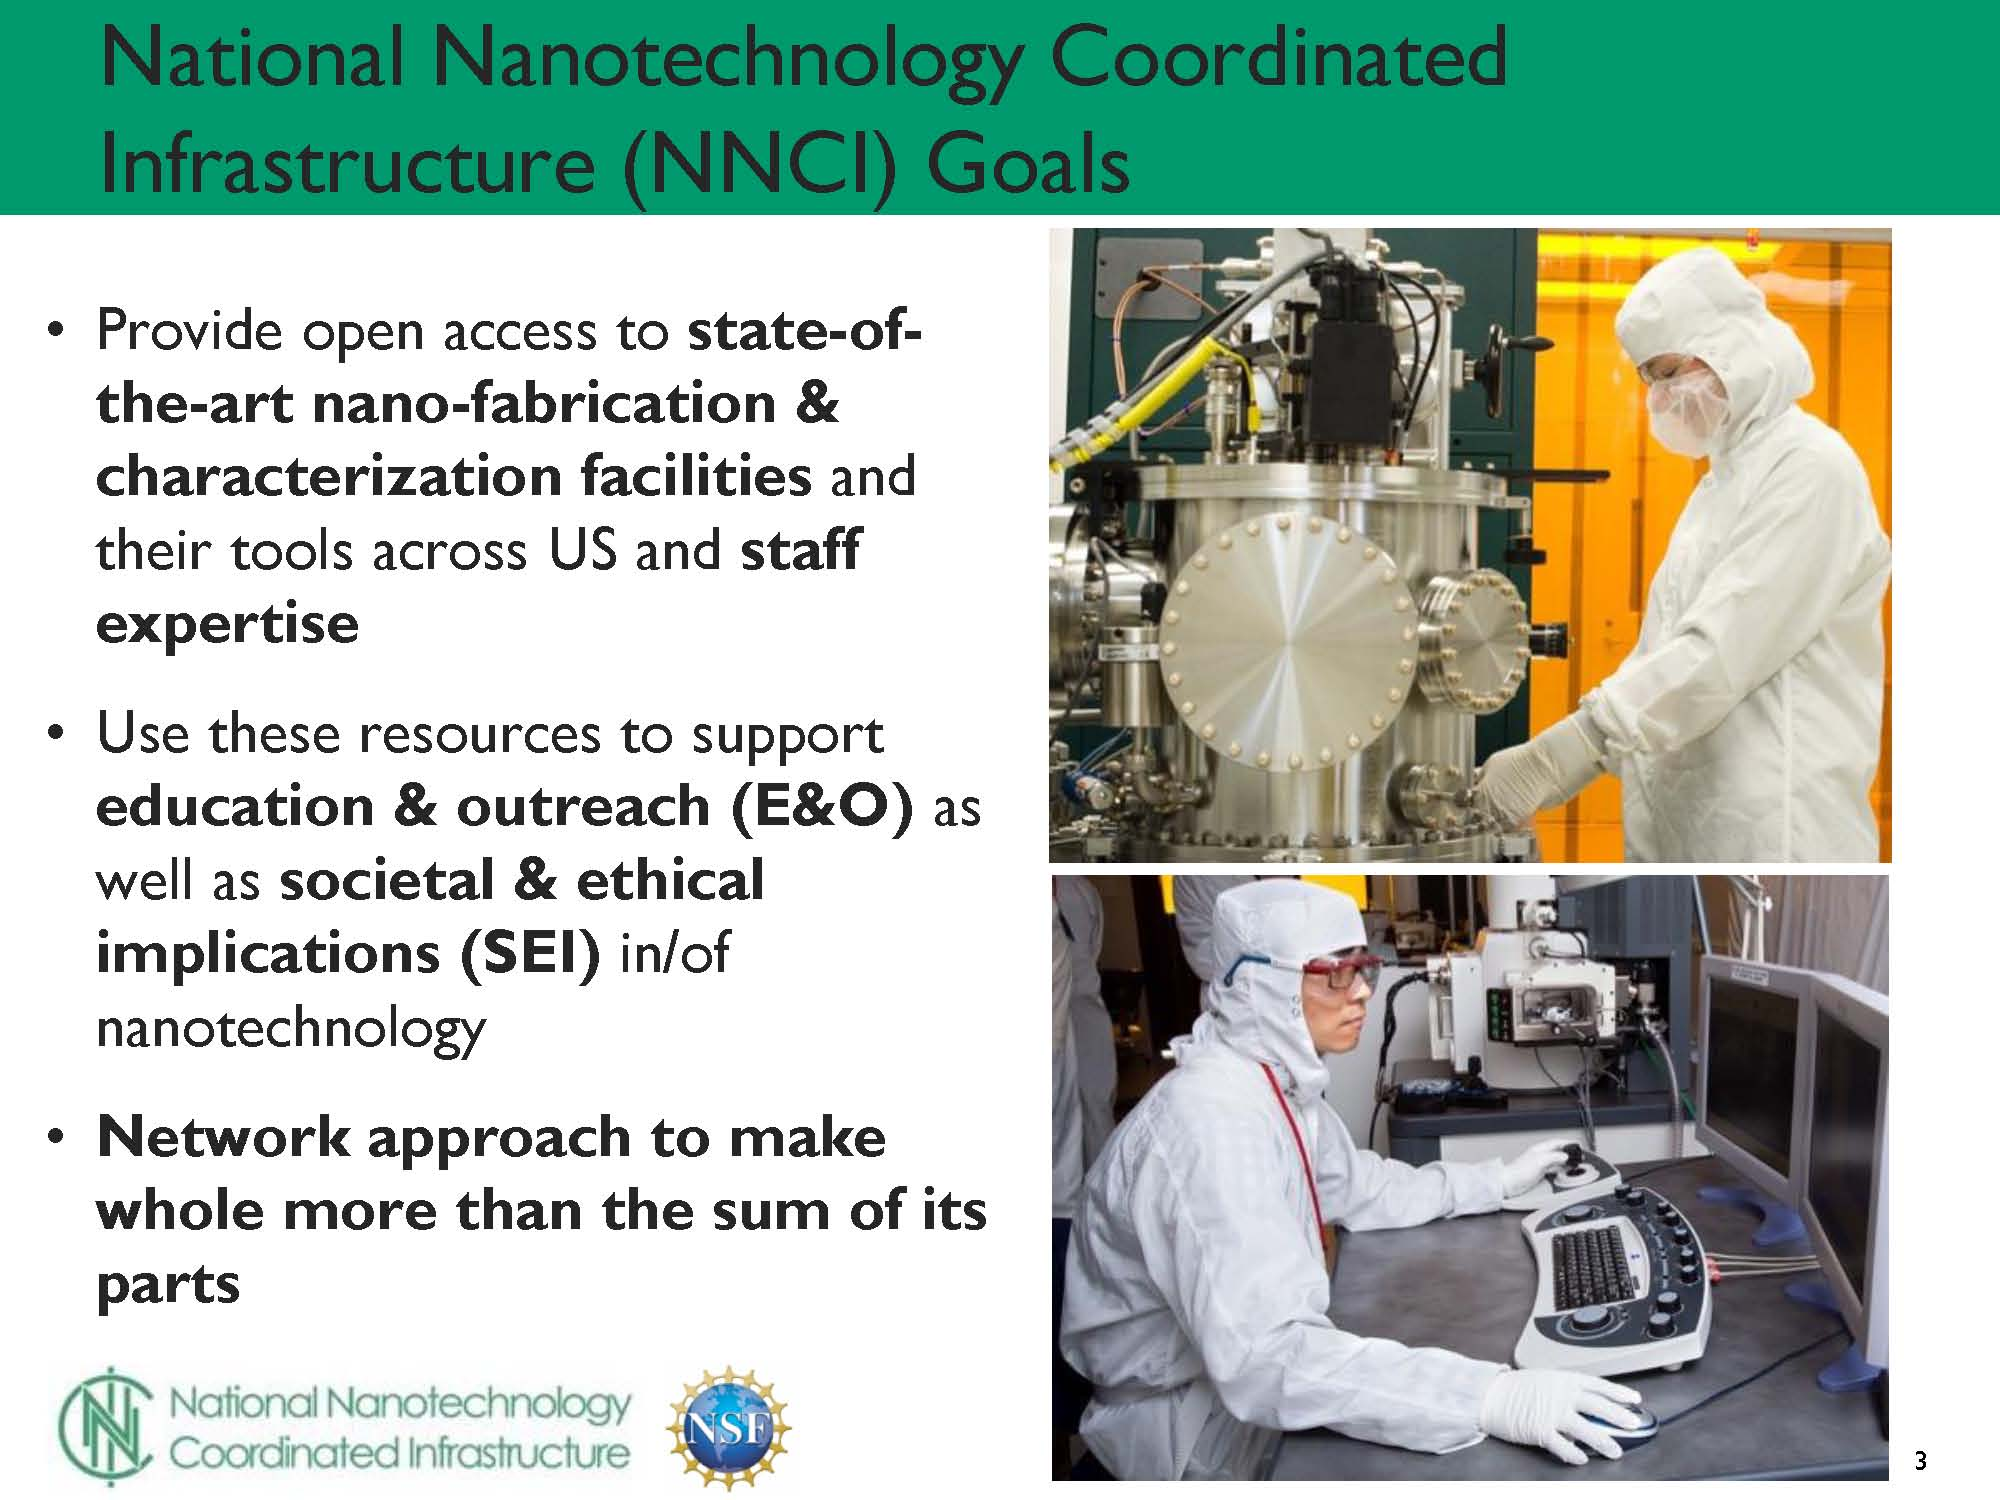 NSF 2017 NanoscienceGrantees Conf - NNCI presentation by Mark Allen_Page_03.jpg